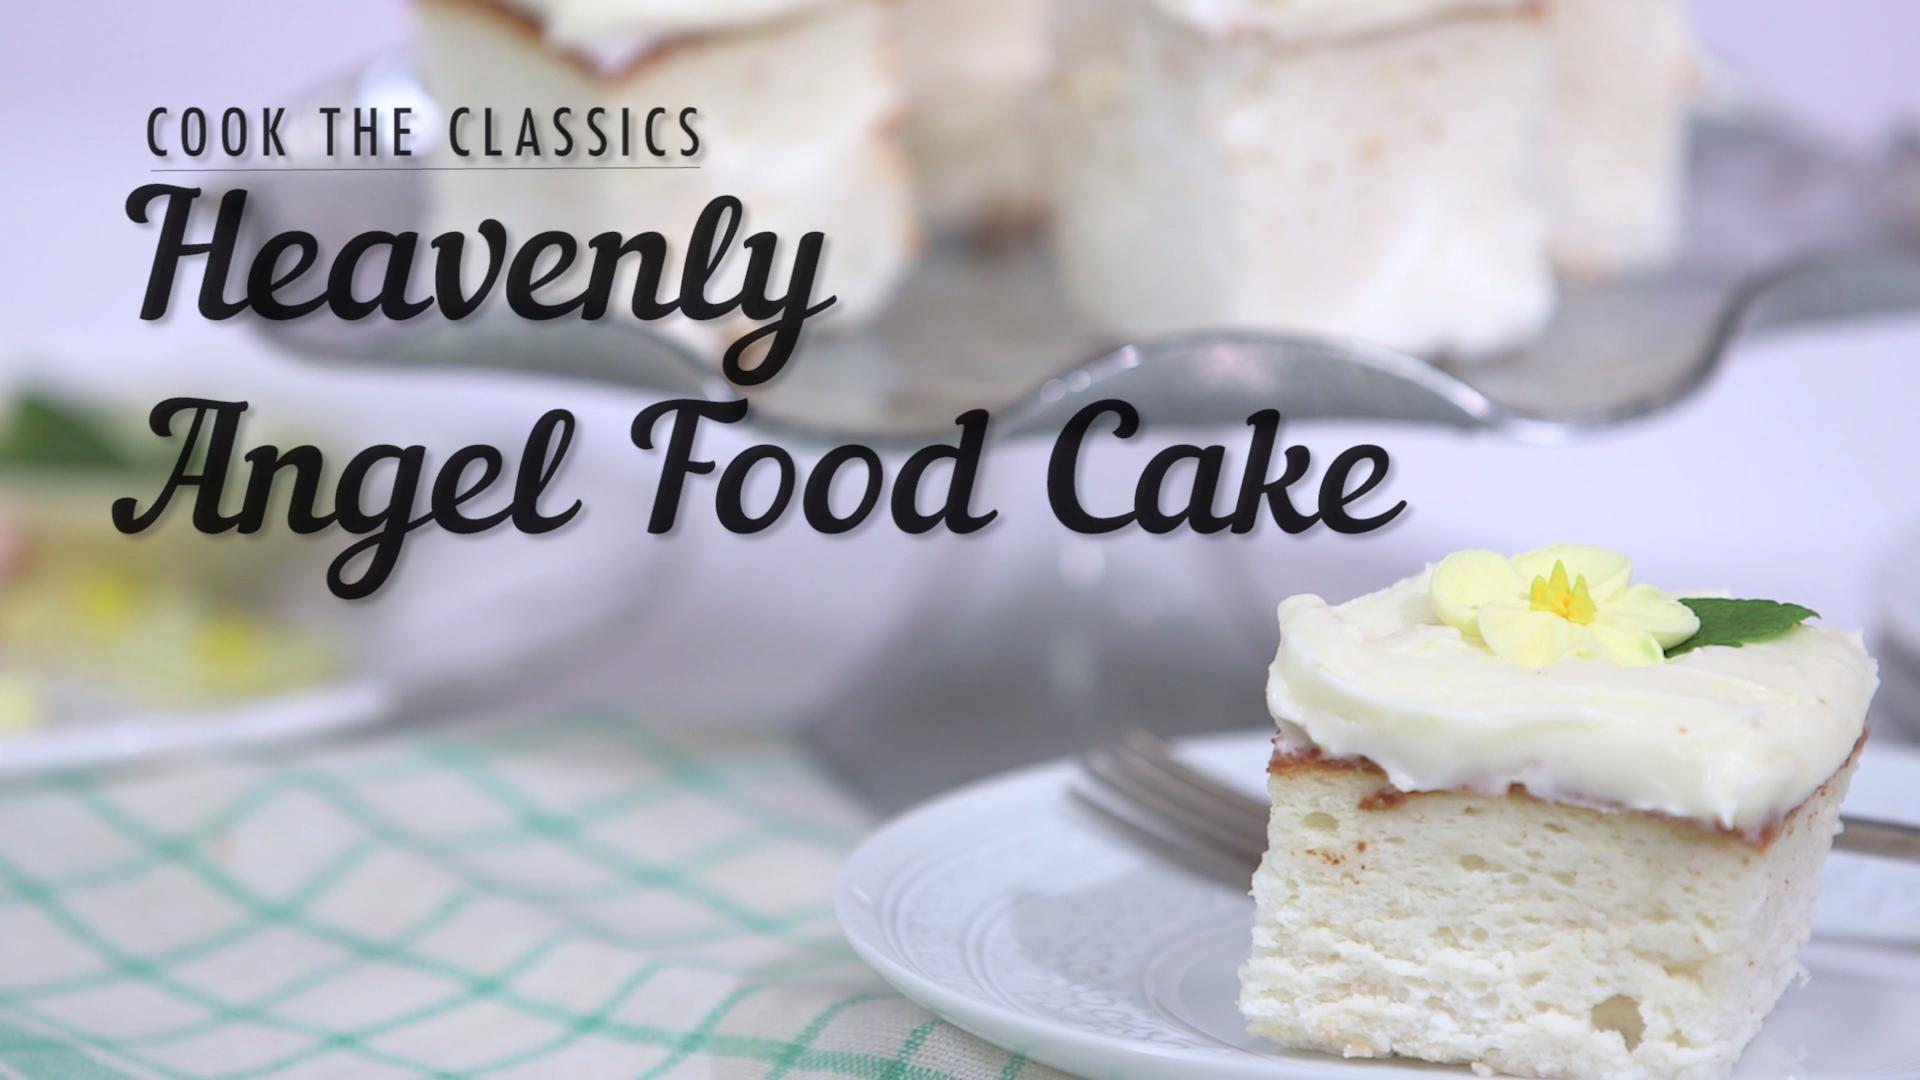 How to Make Classic Angel Food Cake